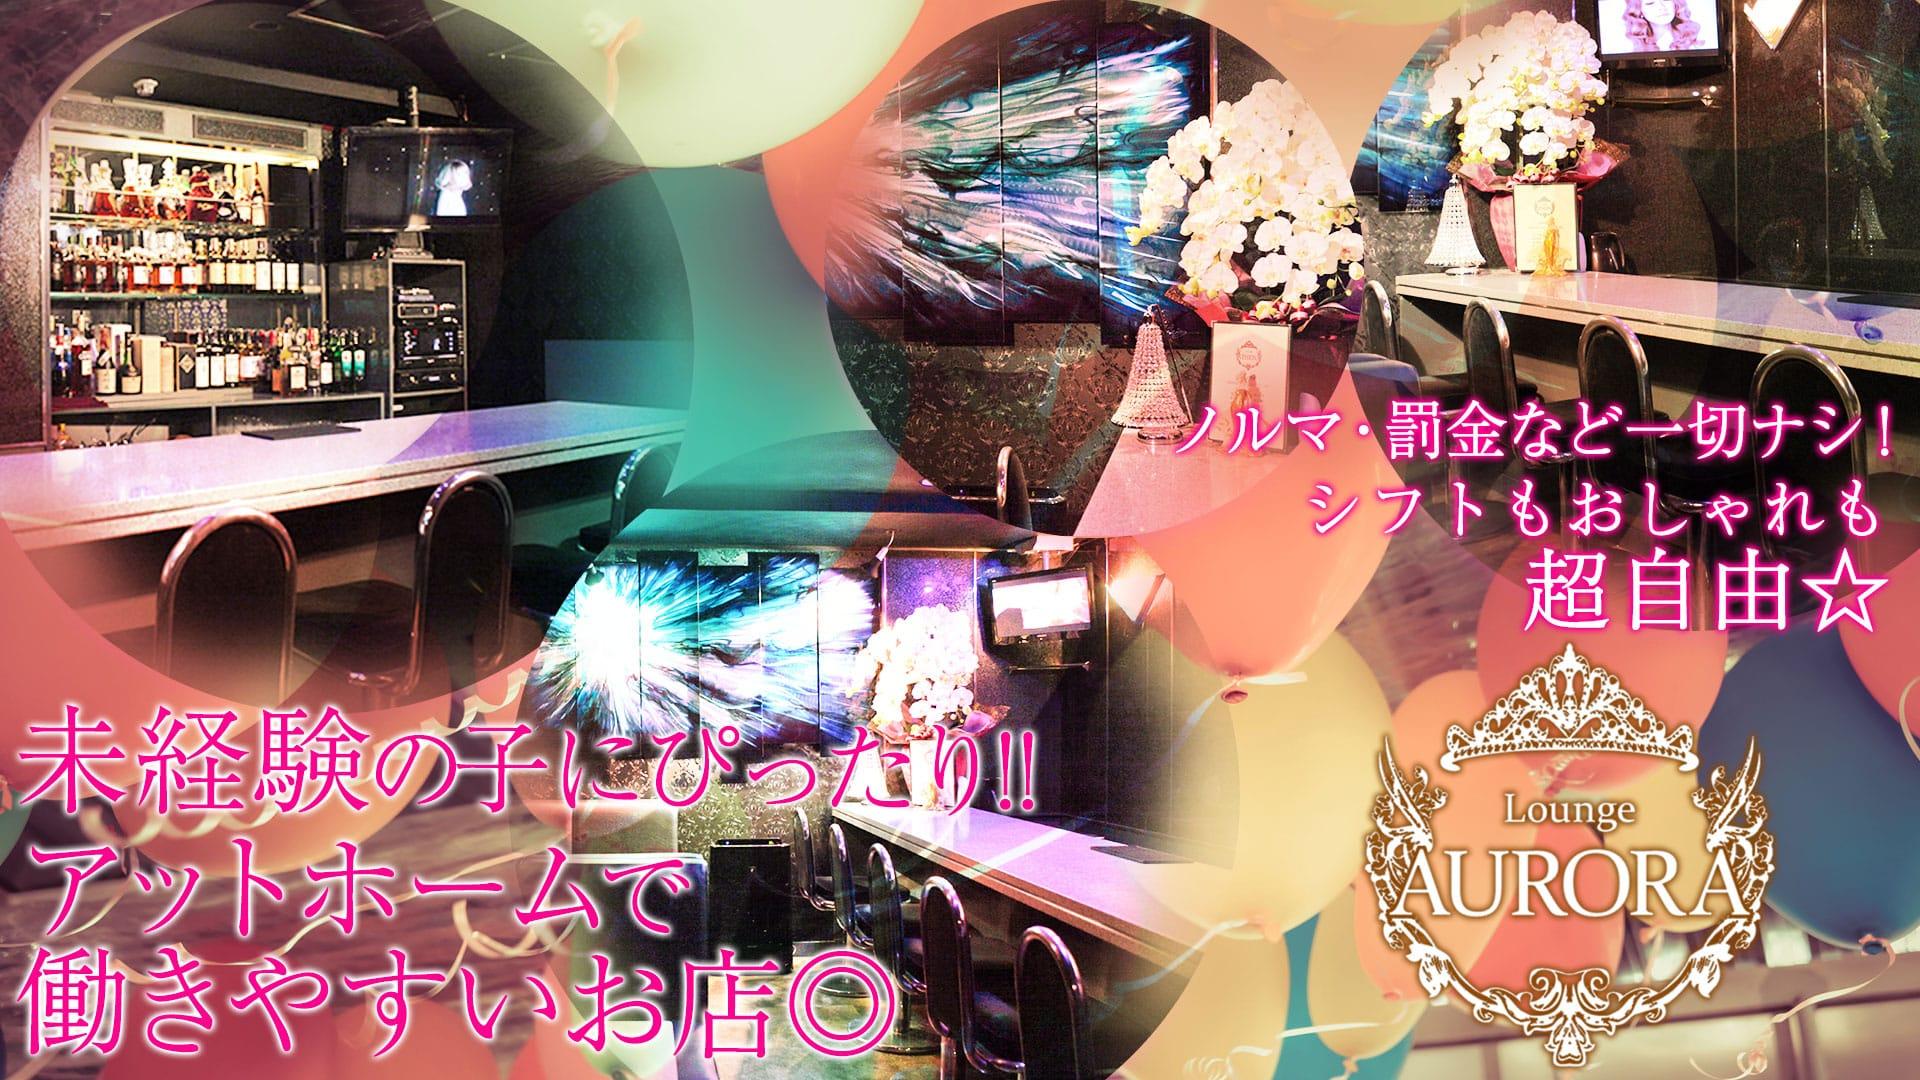 Girl's Bar AURORA (アウロラ) 新橋ガールズバー TOP画像